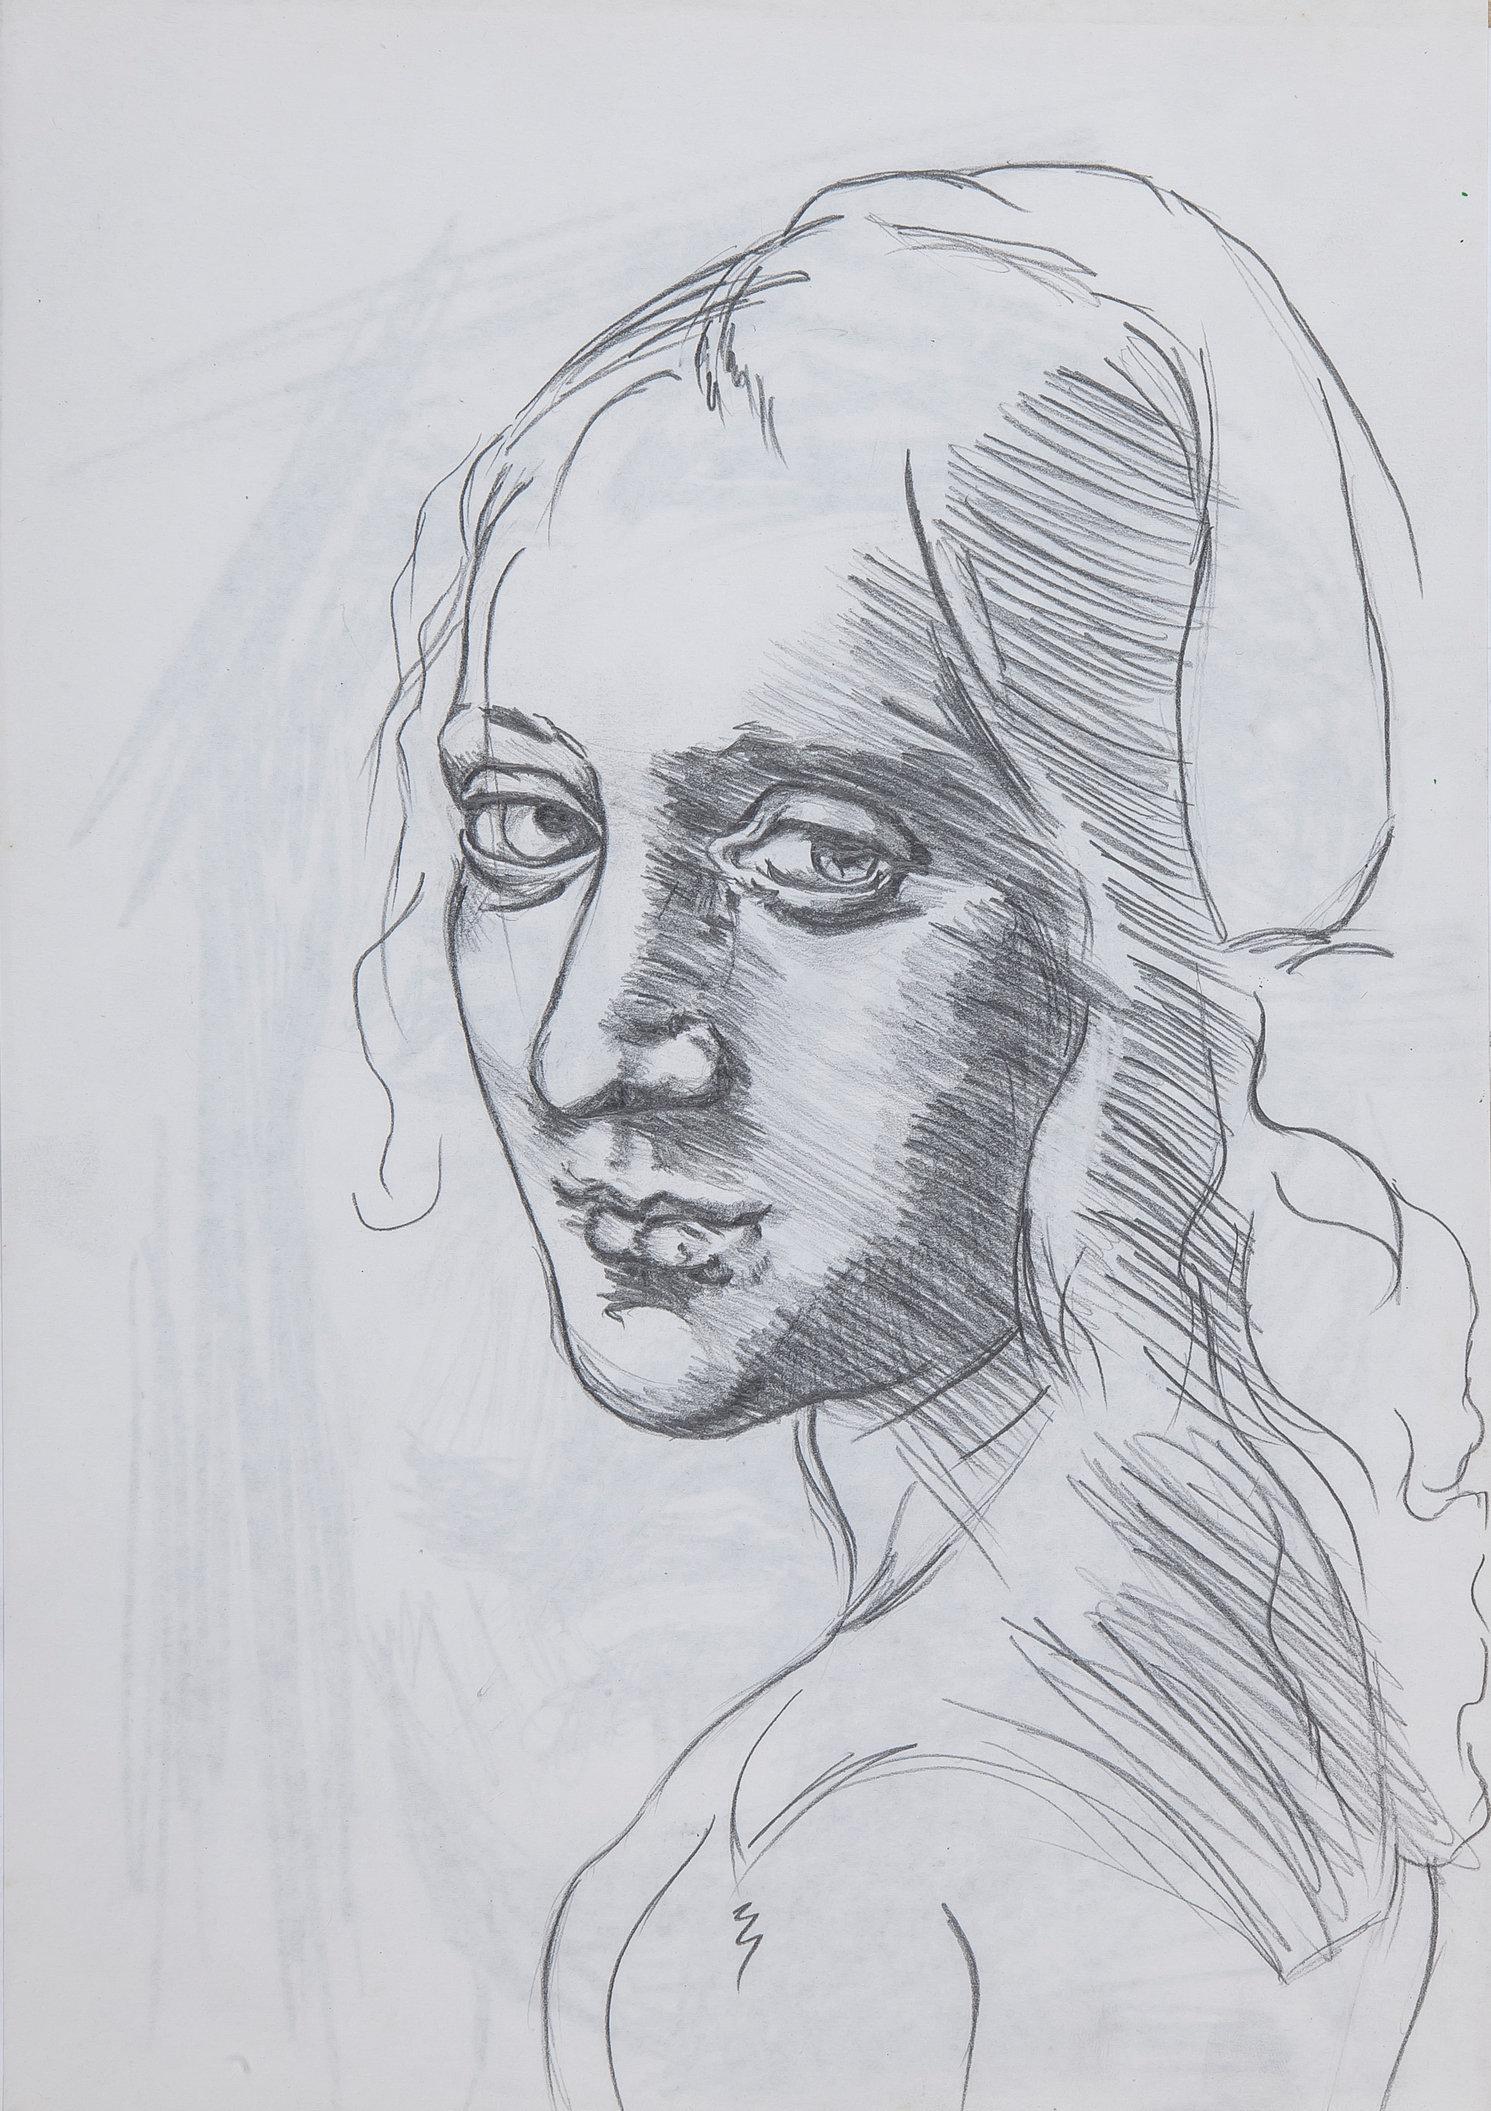 Woman 2 - Study (Da Vinci)